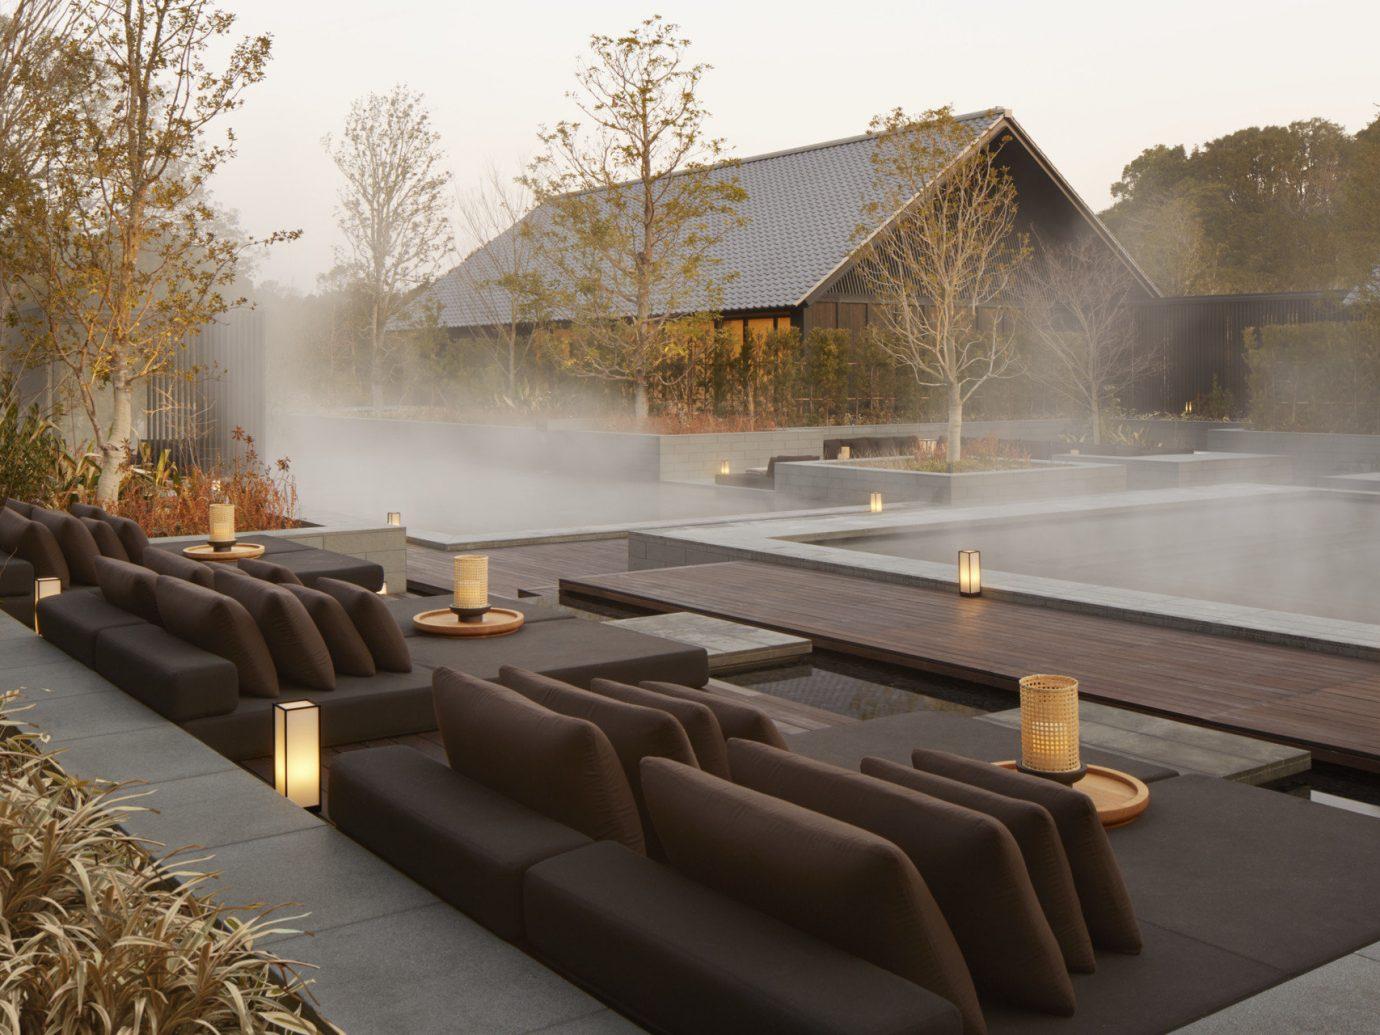 Hotels tree sky outdoor estate interior design Courtyard several